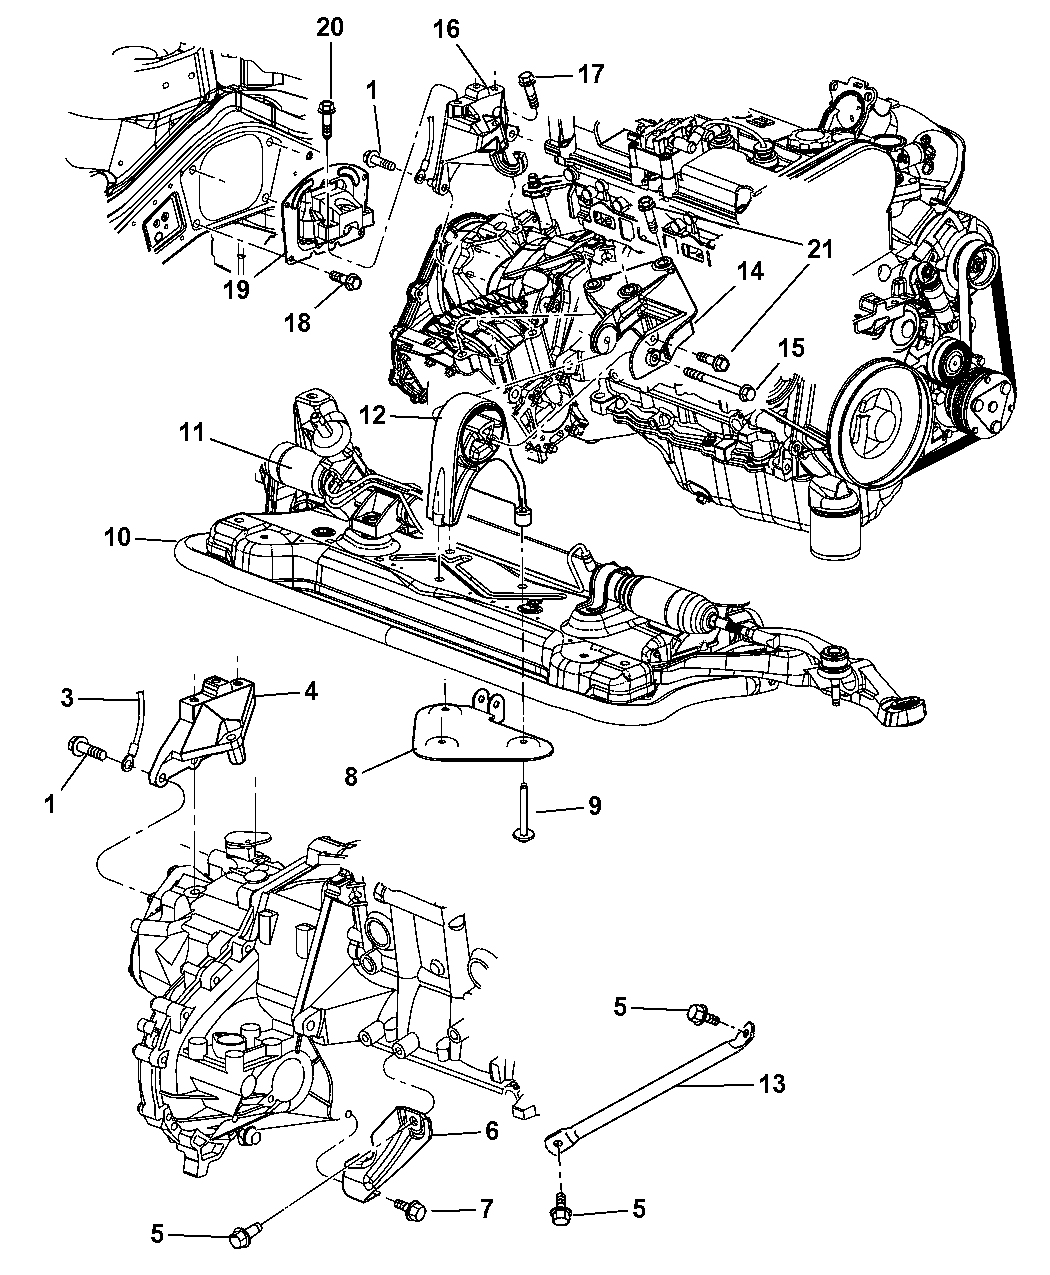 chrysler sebring 2 7 engine diagram - wiring diagram system work-image -  work-image.ediliadesign.it  ediliadesign.it